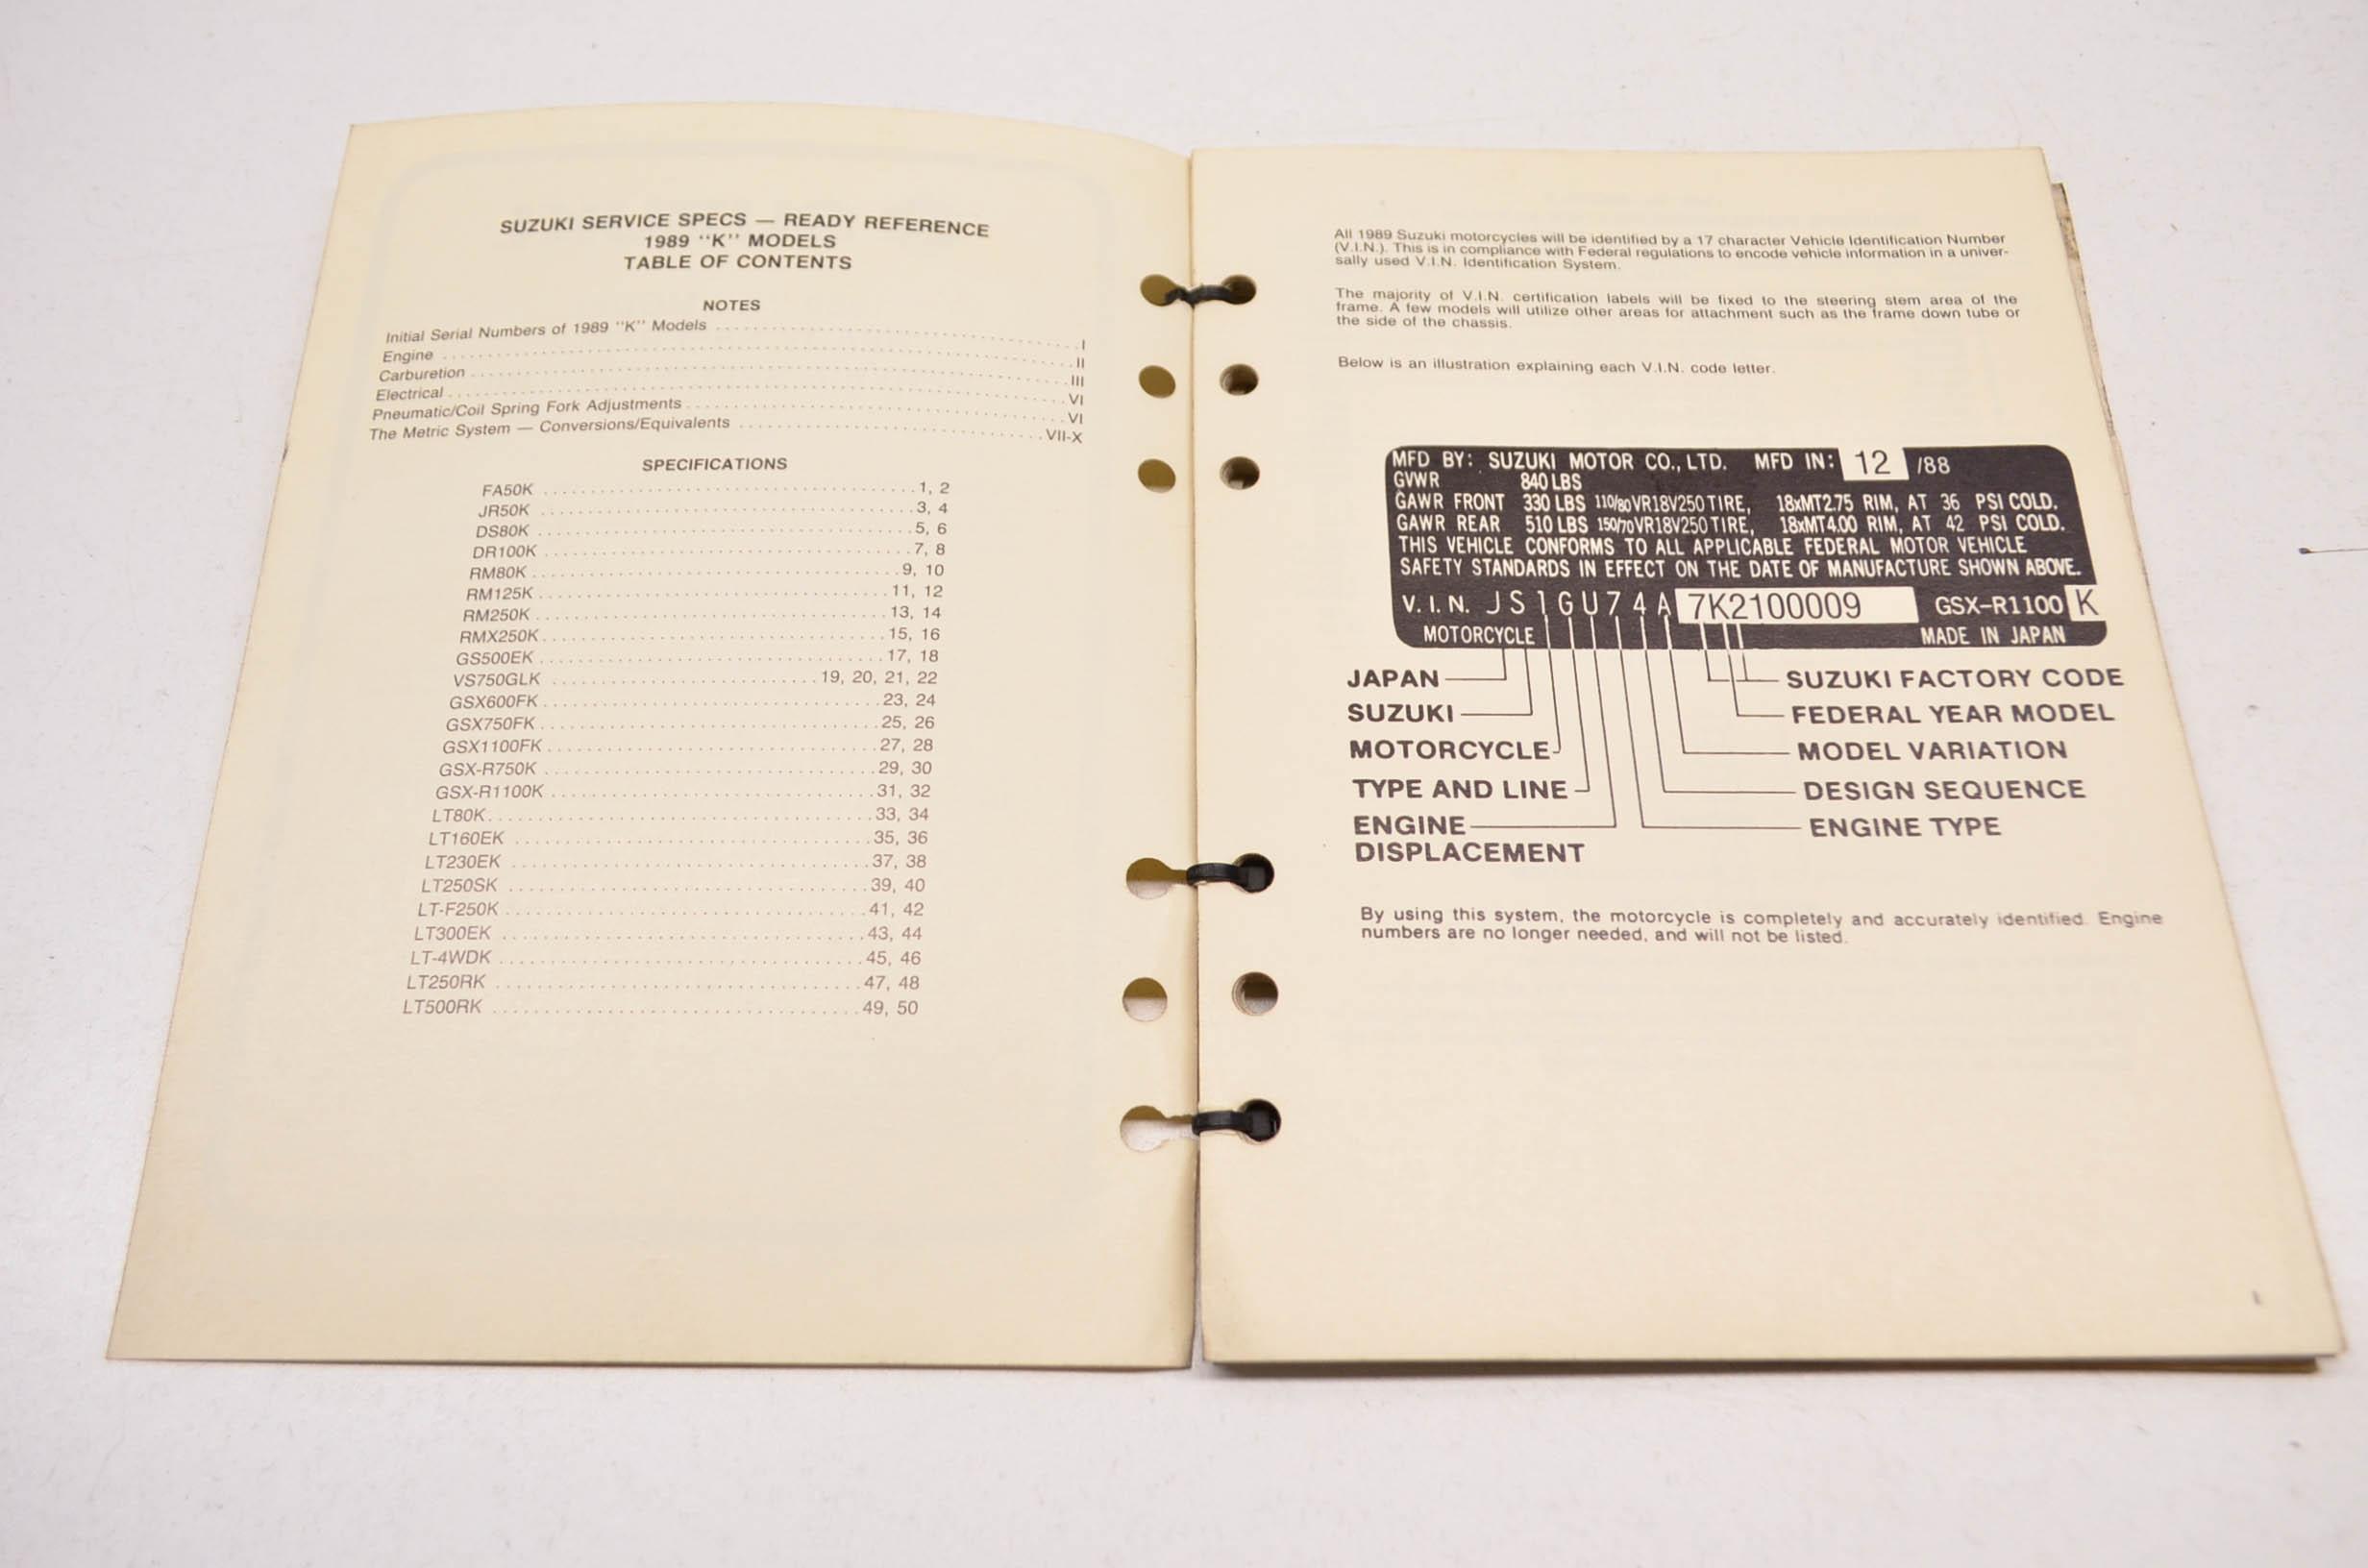 Suzuki 99923-03891 89 K Model Ready Reference Service Specs Manual QTY 1